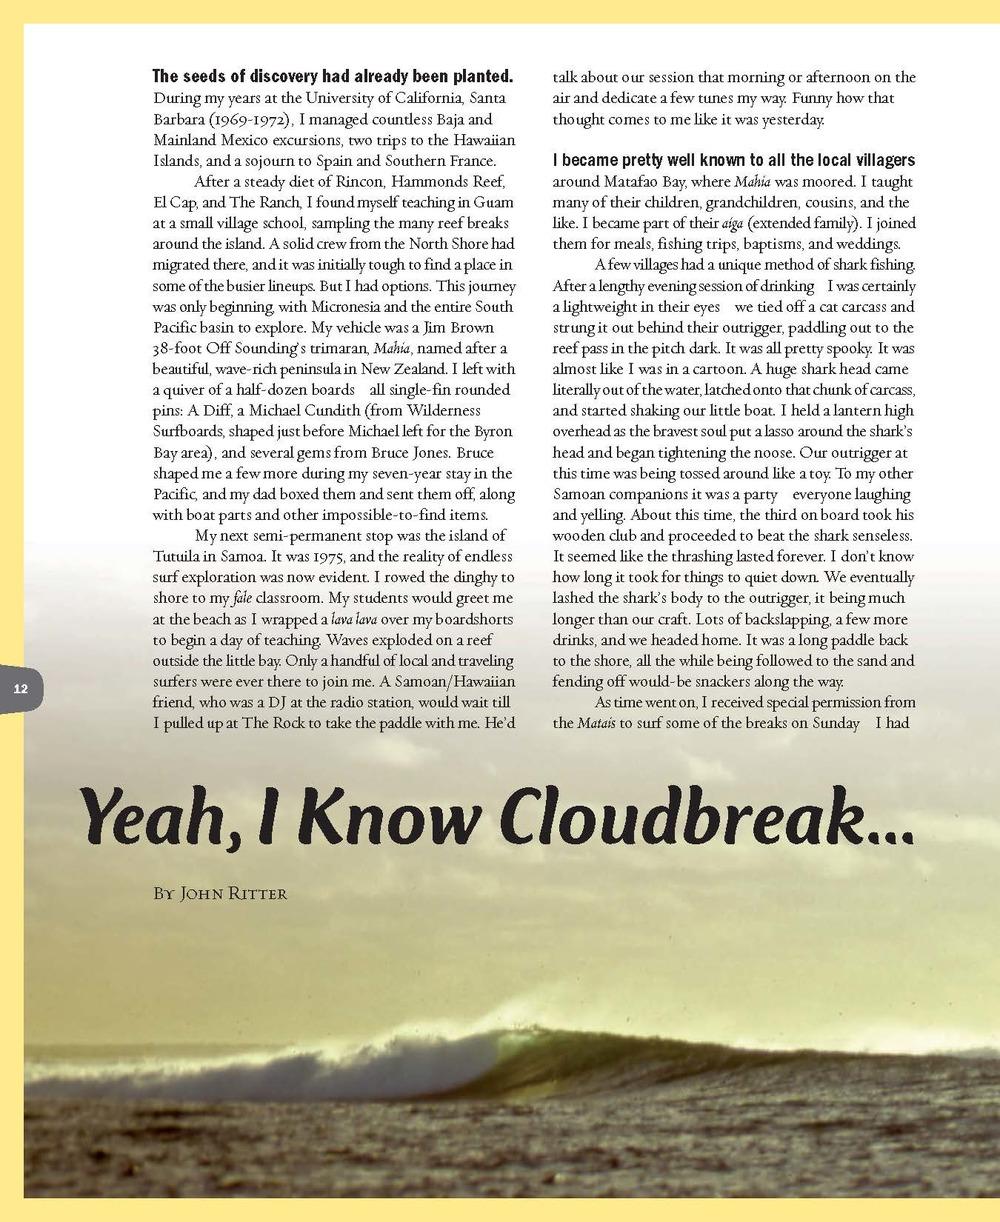 Yea I Know Cloudbreak_Page_2.jpg